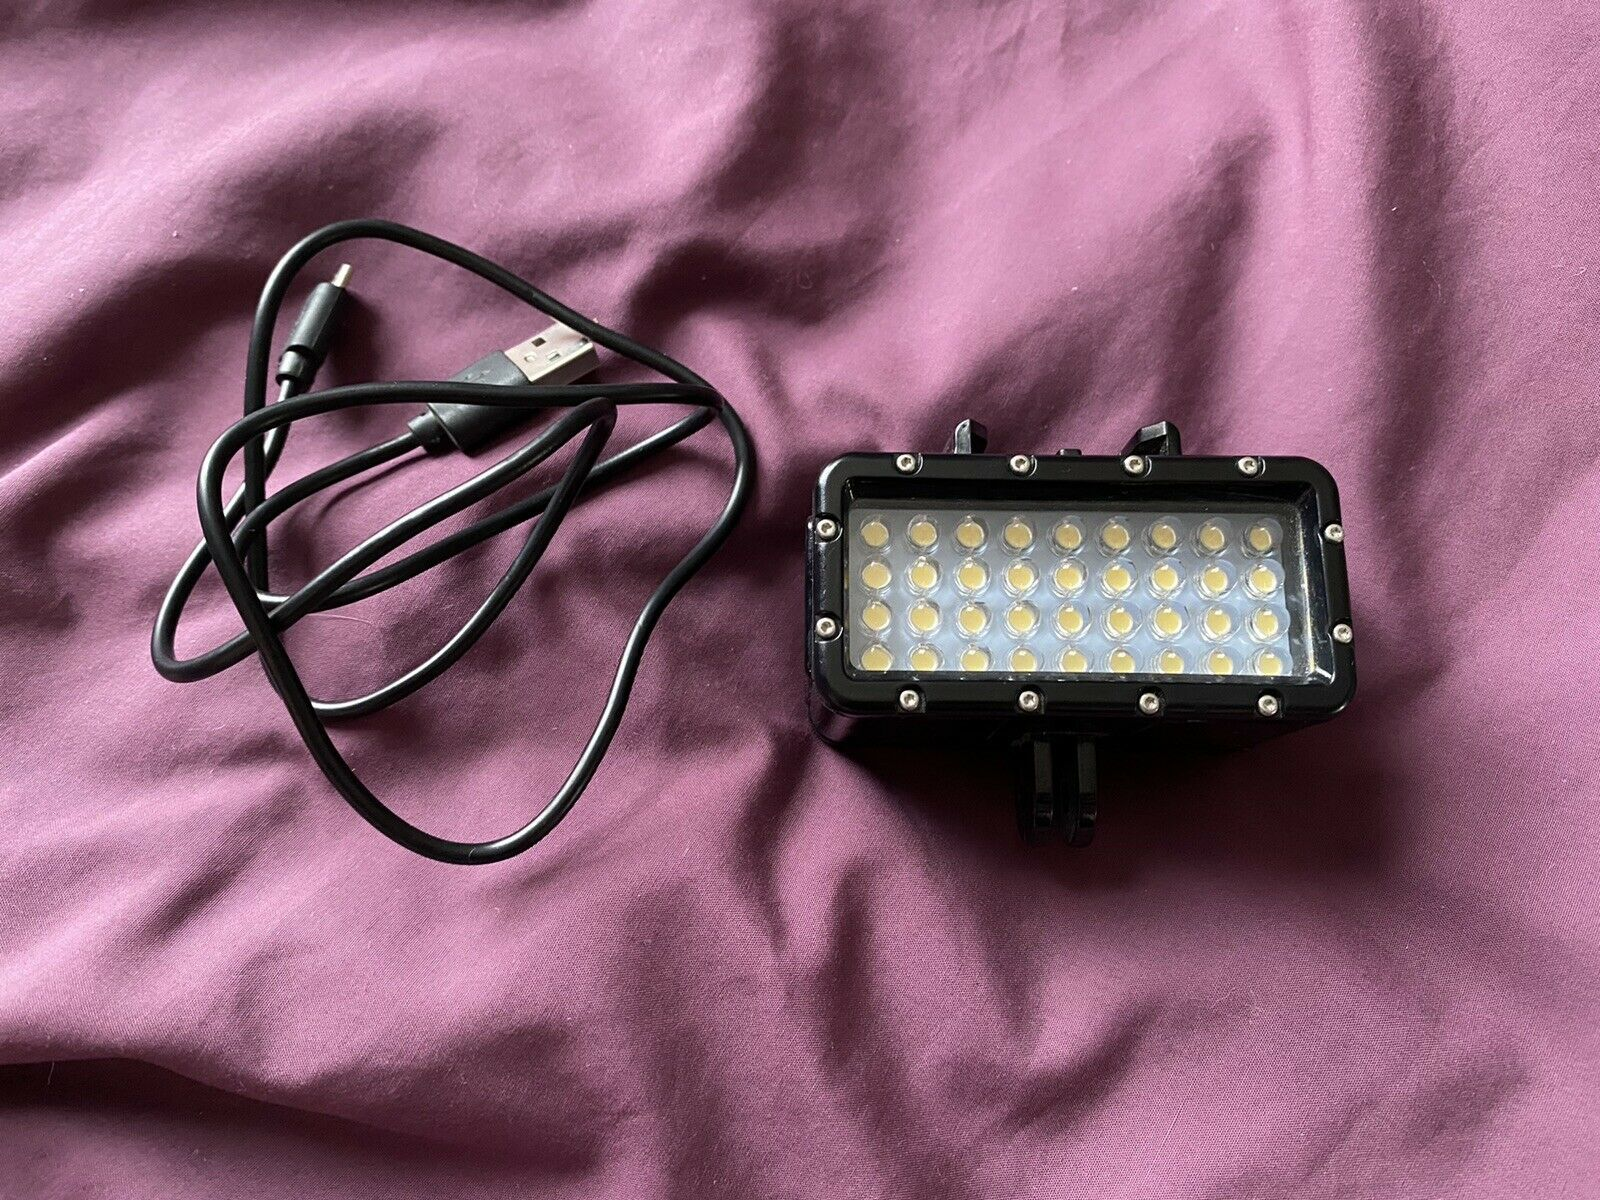 Suptig Waterproof Light For GoPro, LED Video Light